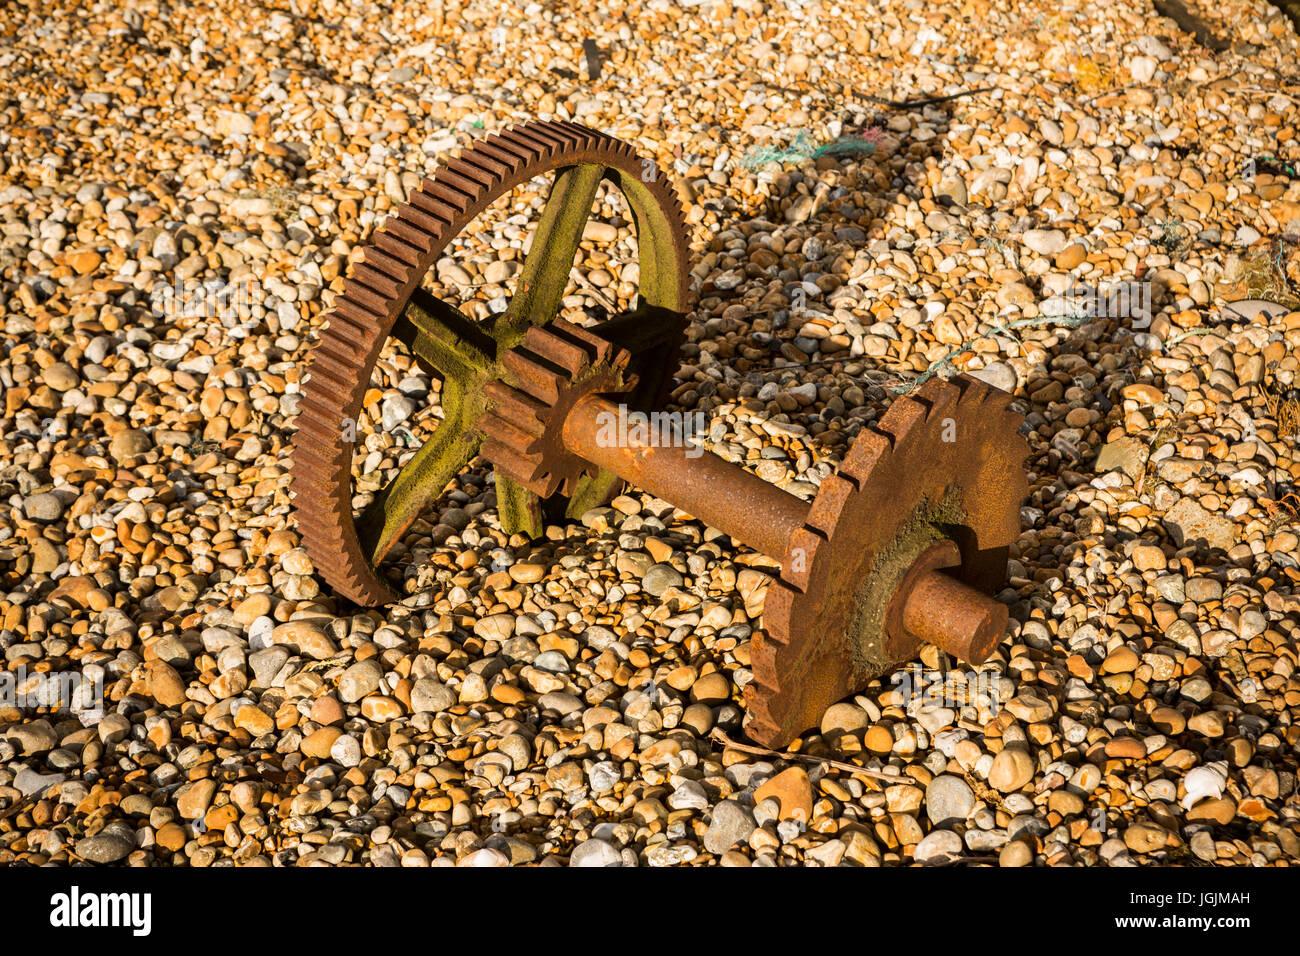 Old rusty cog wheels - Stock Image